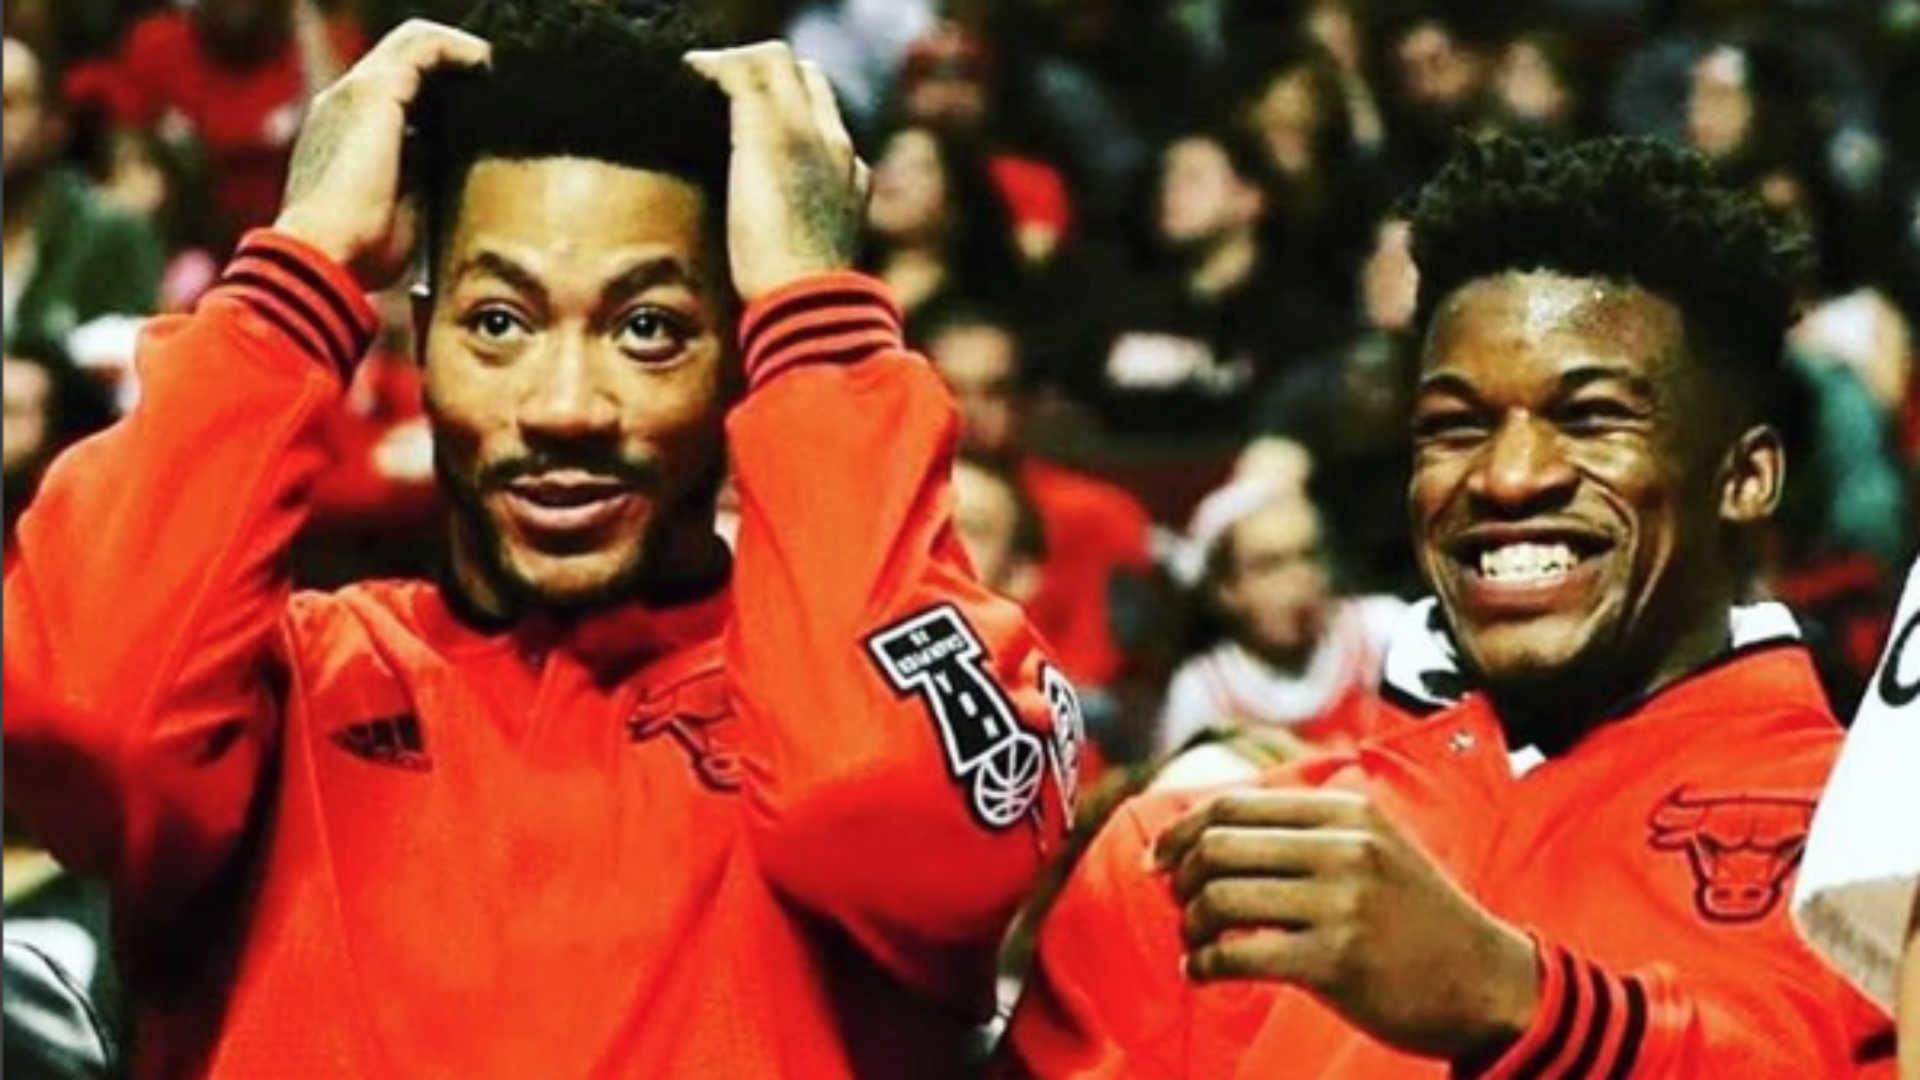 Jimmy Butler posts heartfelt farewell to Derrick Rose after trade to Knicks  | NBA | Sporting News